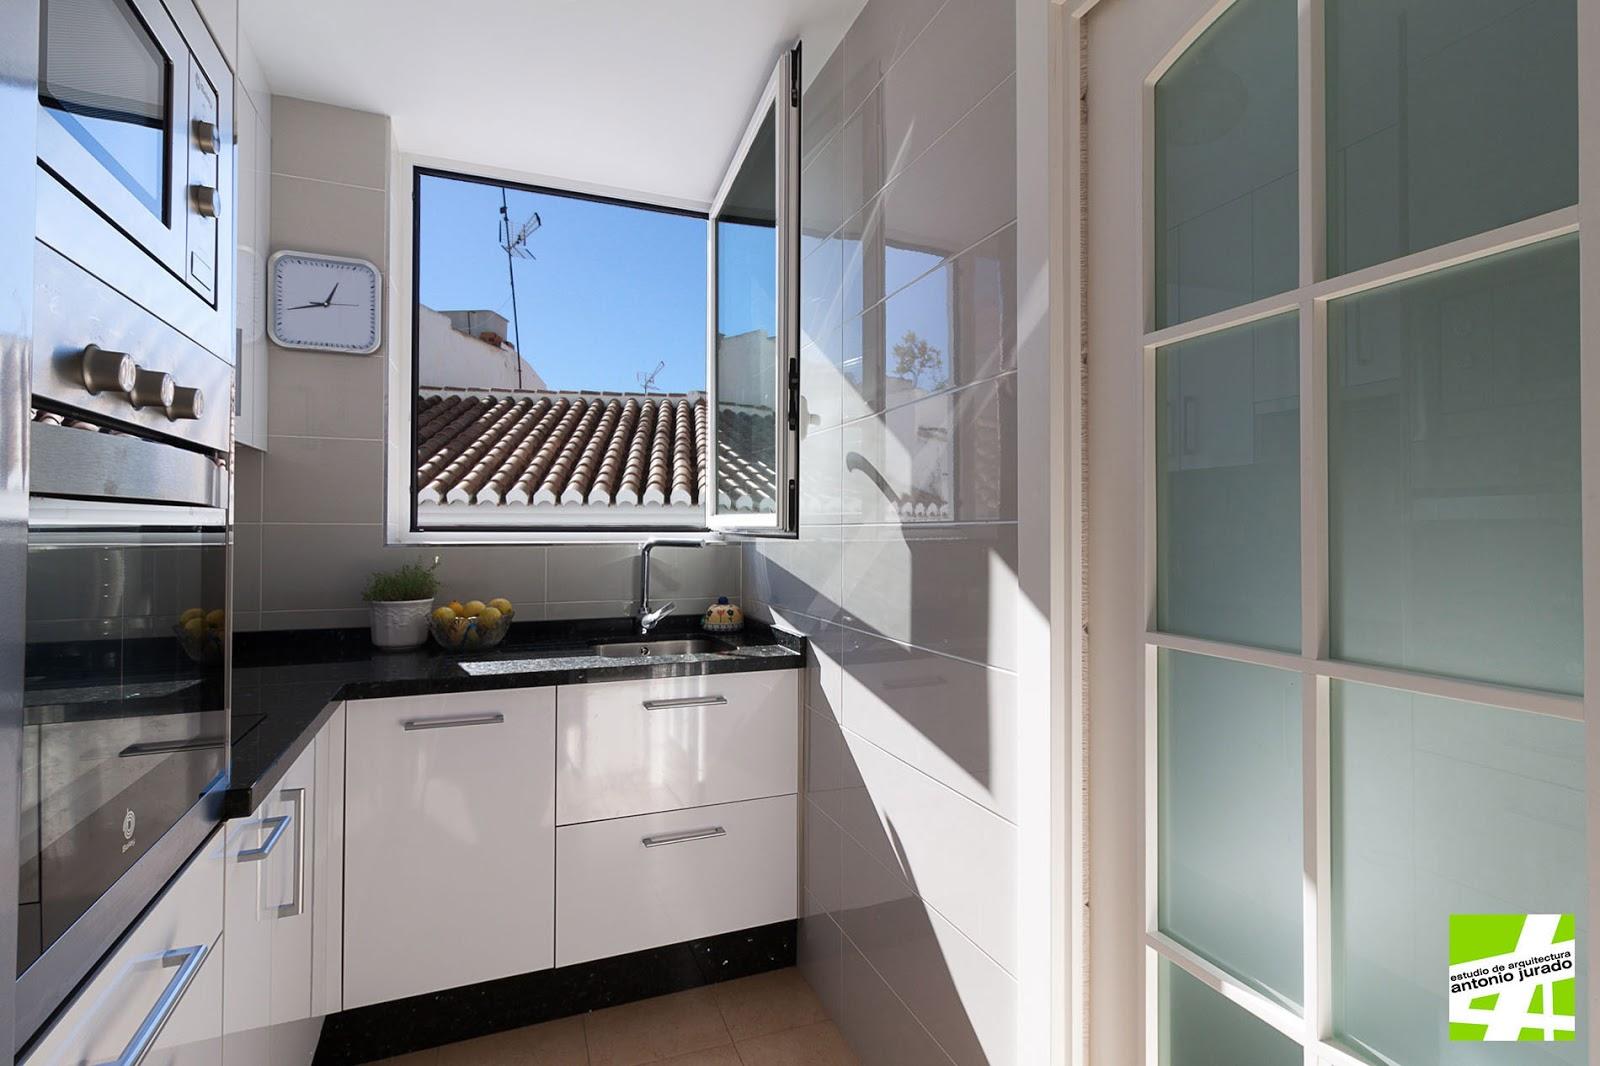 casa-sc-torrox-ampliacion-reforma-vivienda-antonio-jurado-arquitecto-torrox-malaga-03